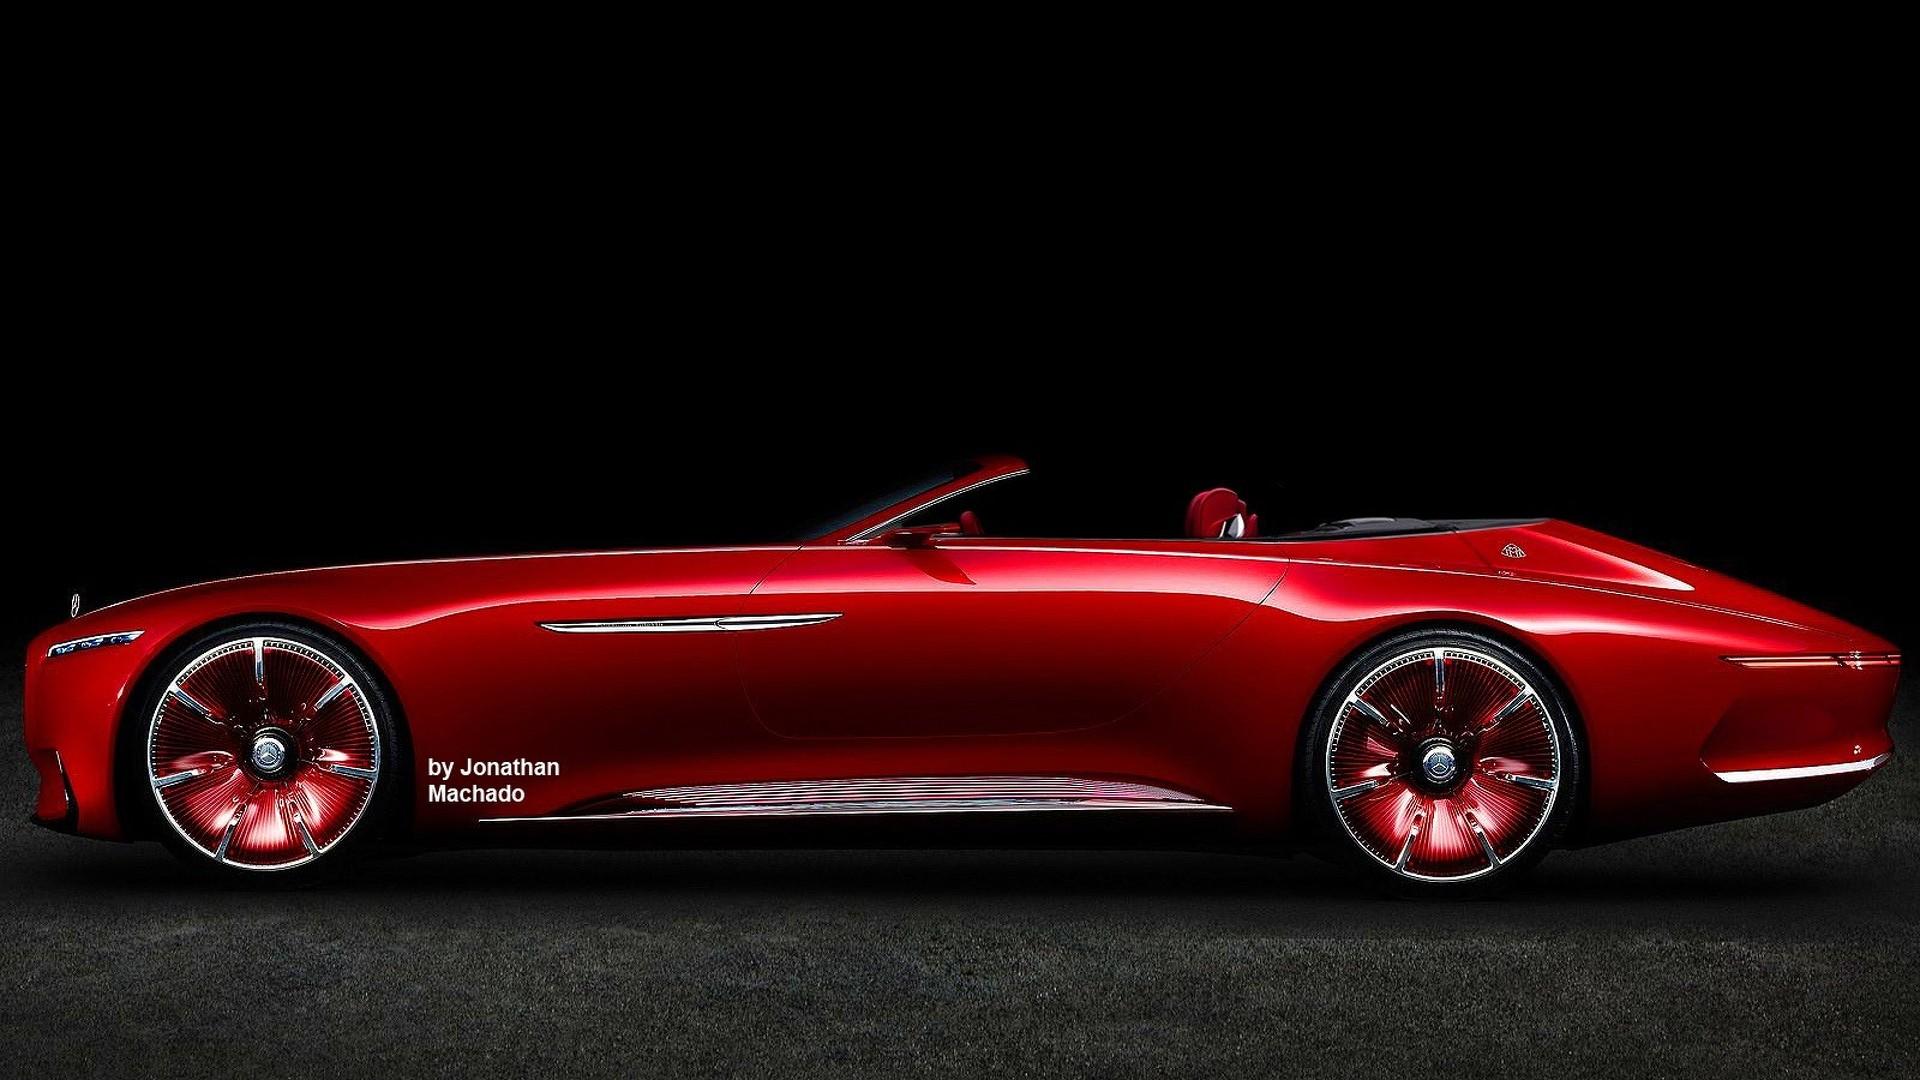 mb-exotenforum - sonderkarossen/umbauten/tuning - neue maybach-coupé